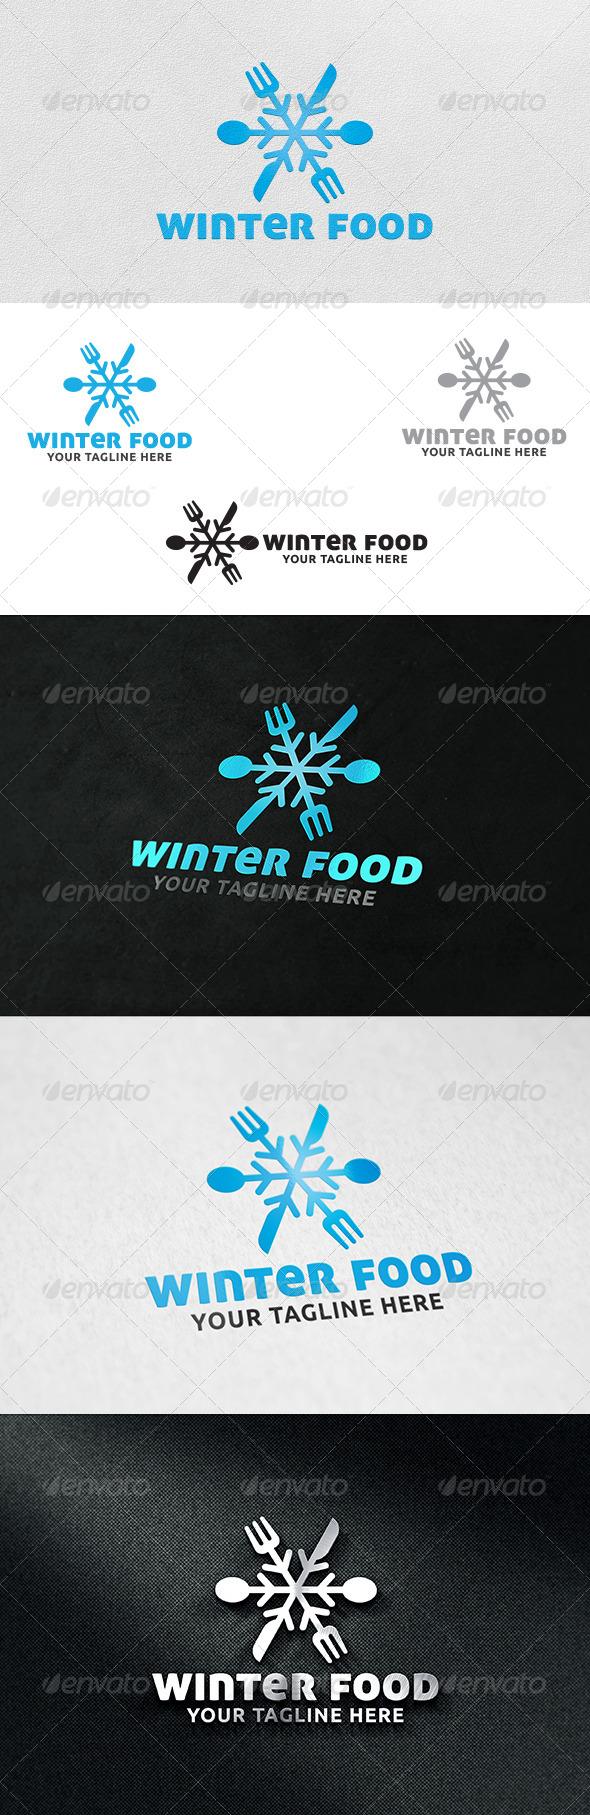 Winter Food V2 - Logo Template - Food Logo Templates